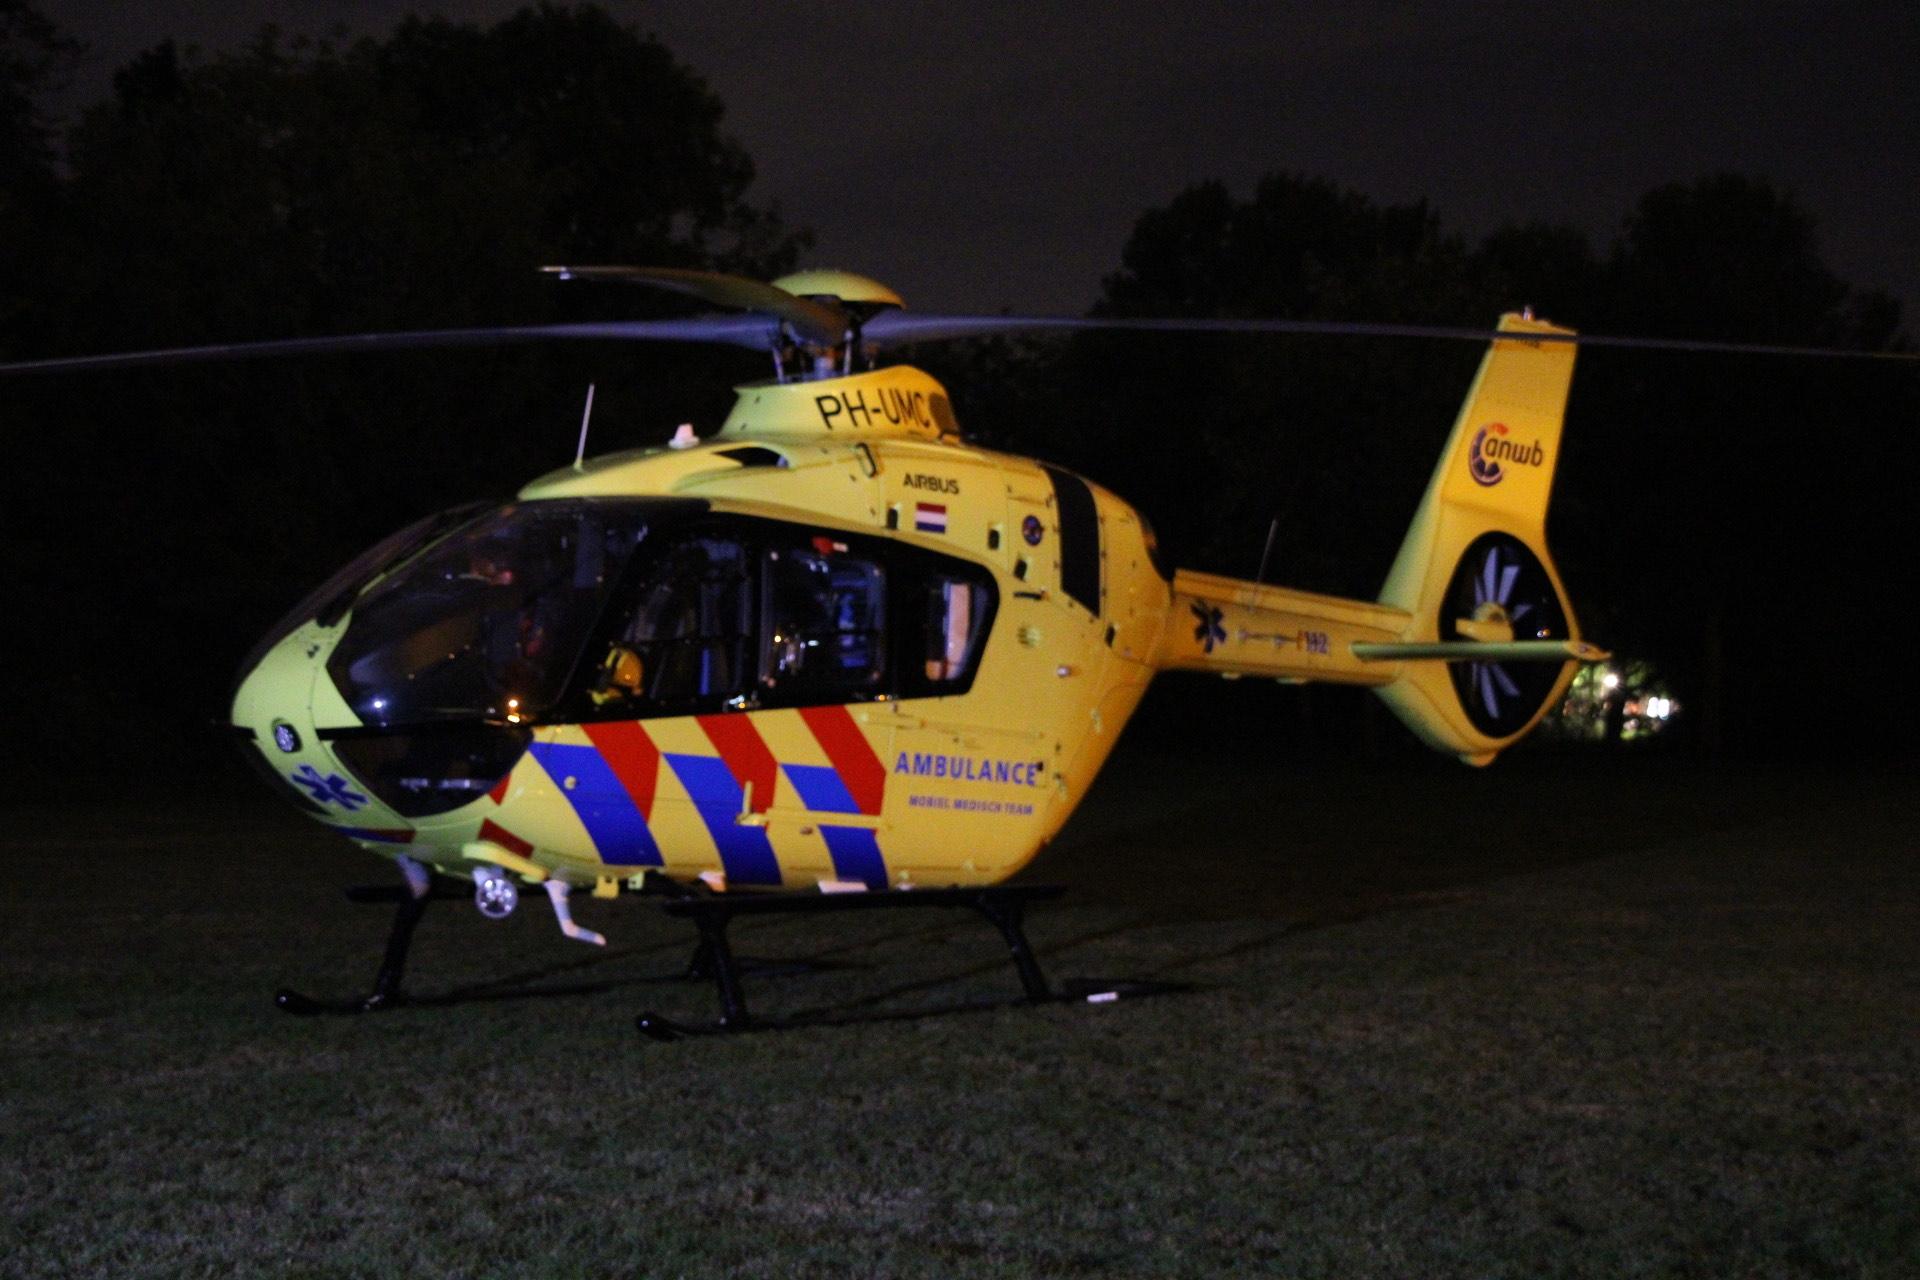 Traumahelikopter landt in Mheenpark Apeldoorn